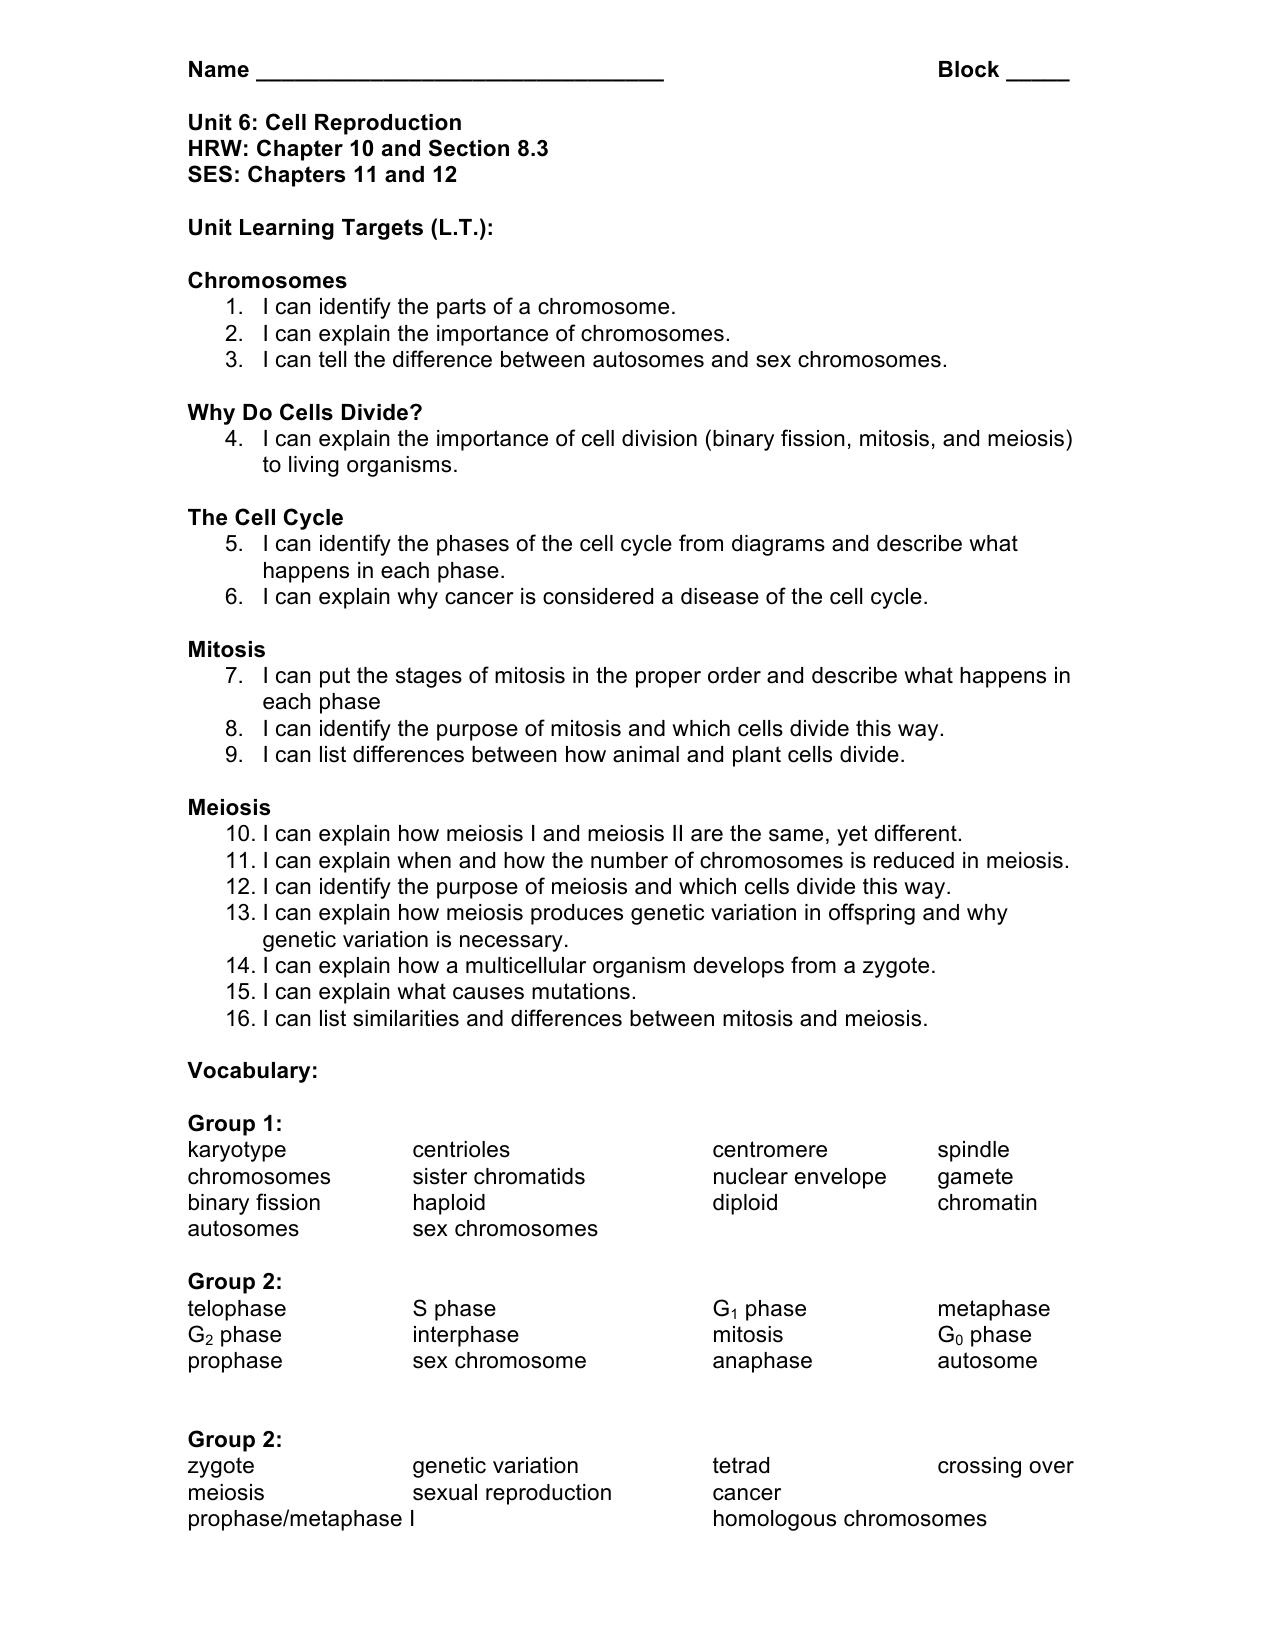 Unit 6 - Waukee Community School District Blogs